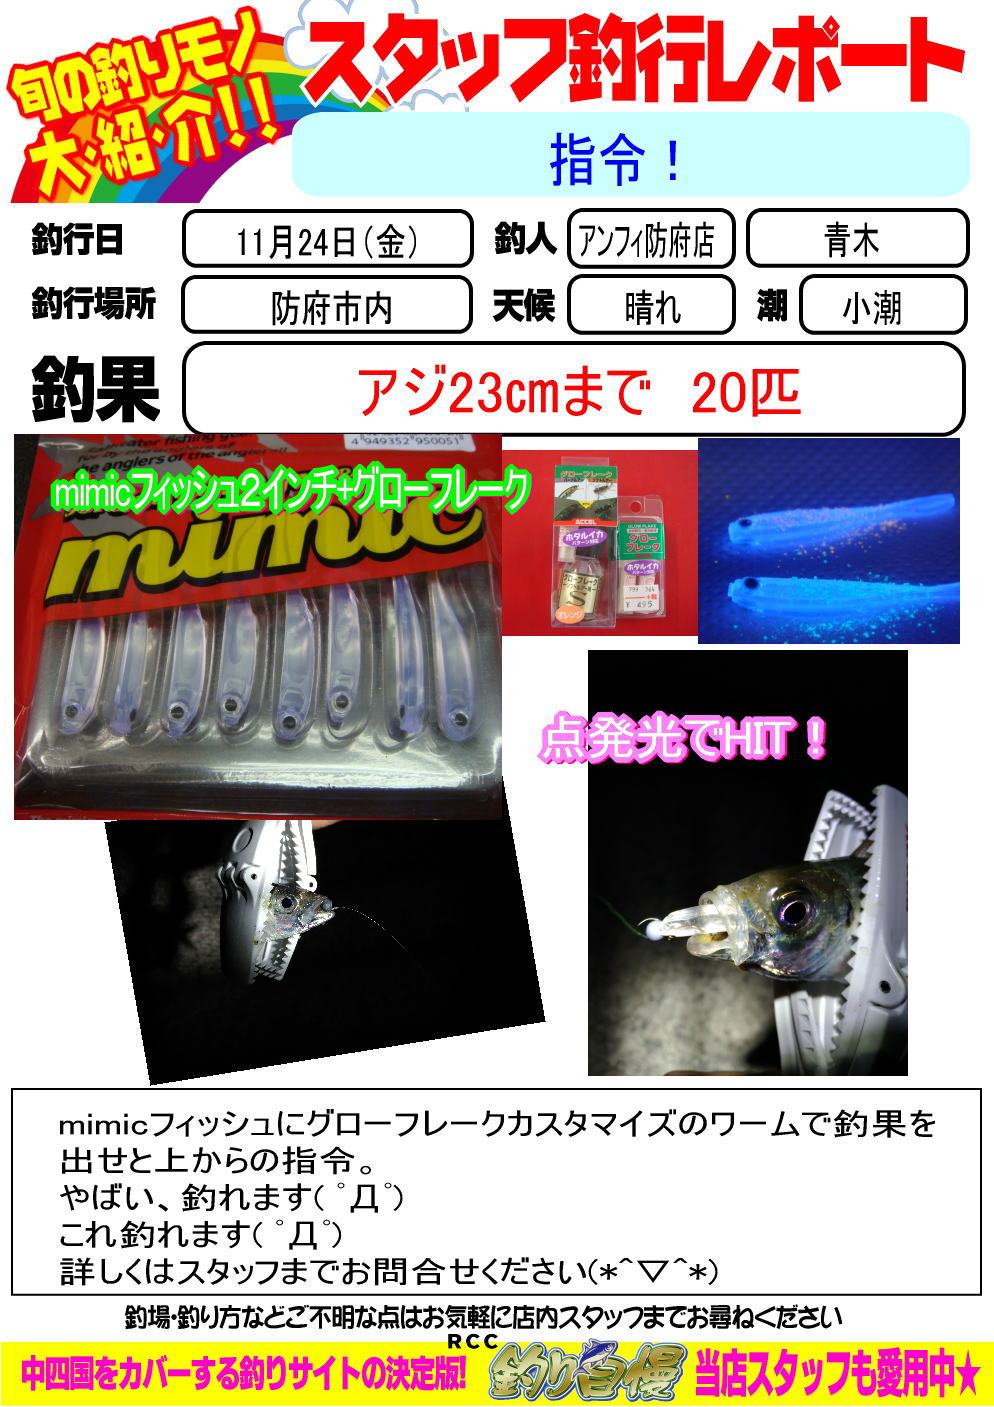 http://www.e-angle.co.jp/shop/blog/blog-20171124-houfu-aji.jpg